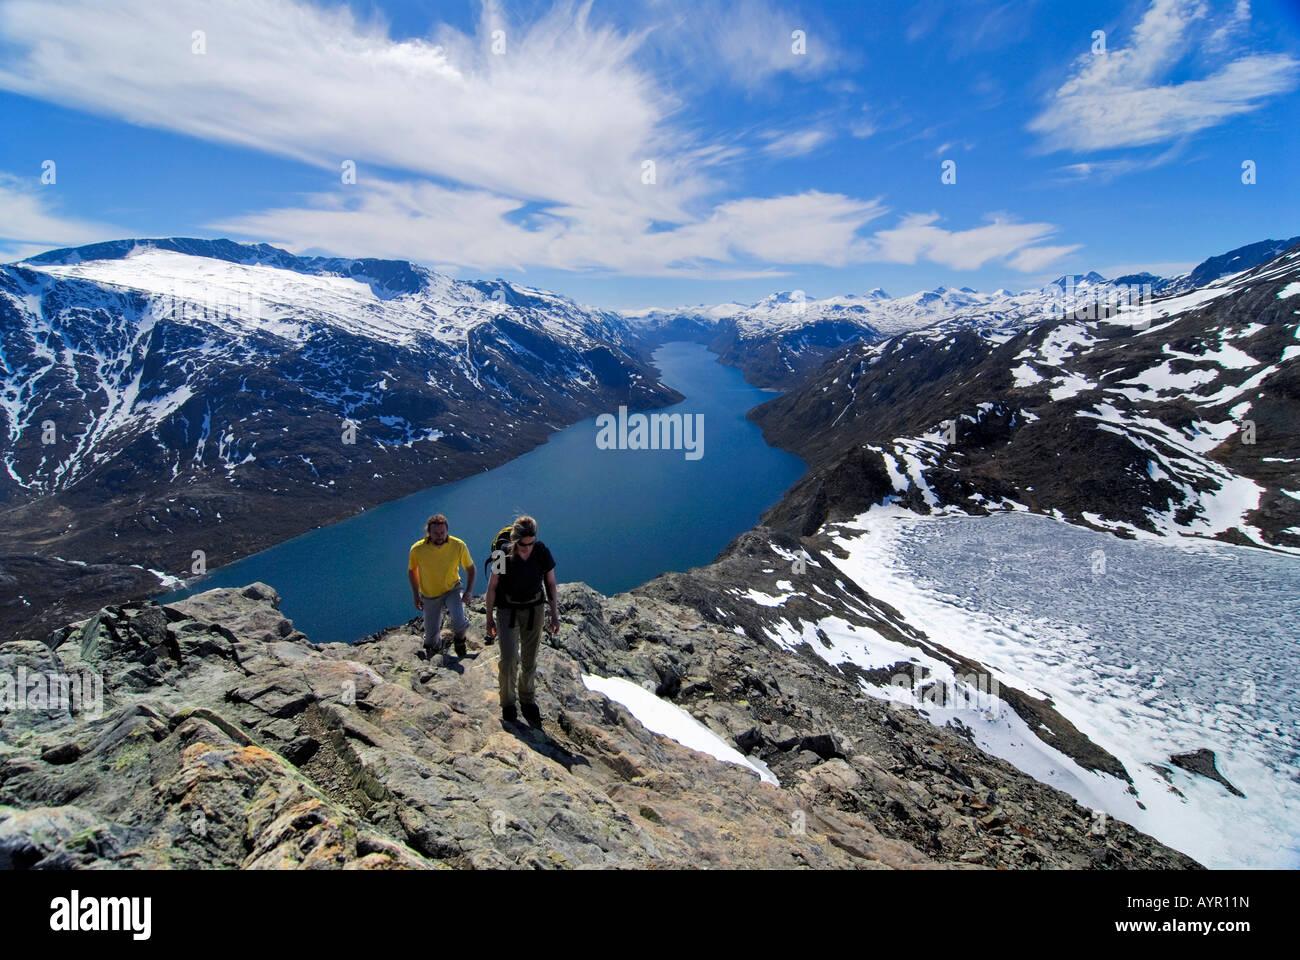 Two hikers at Besseggen Ridge between Lake Gjende and Lake Bessvatnet, Jotunheimen National Park, Vaga, Oppland, - Stock Image